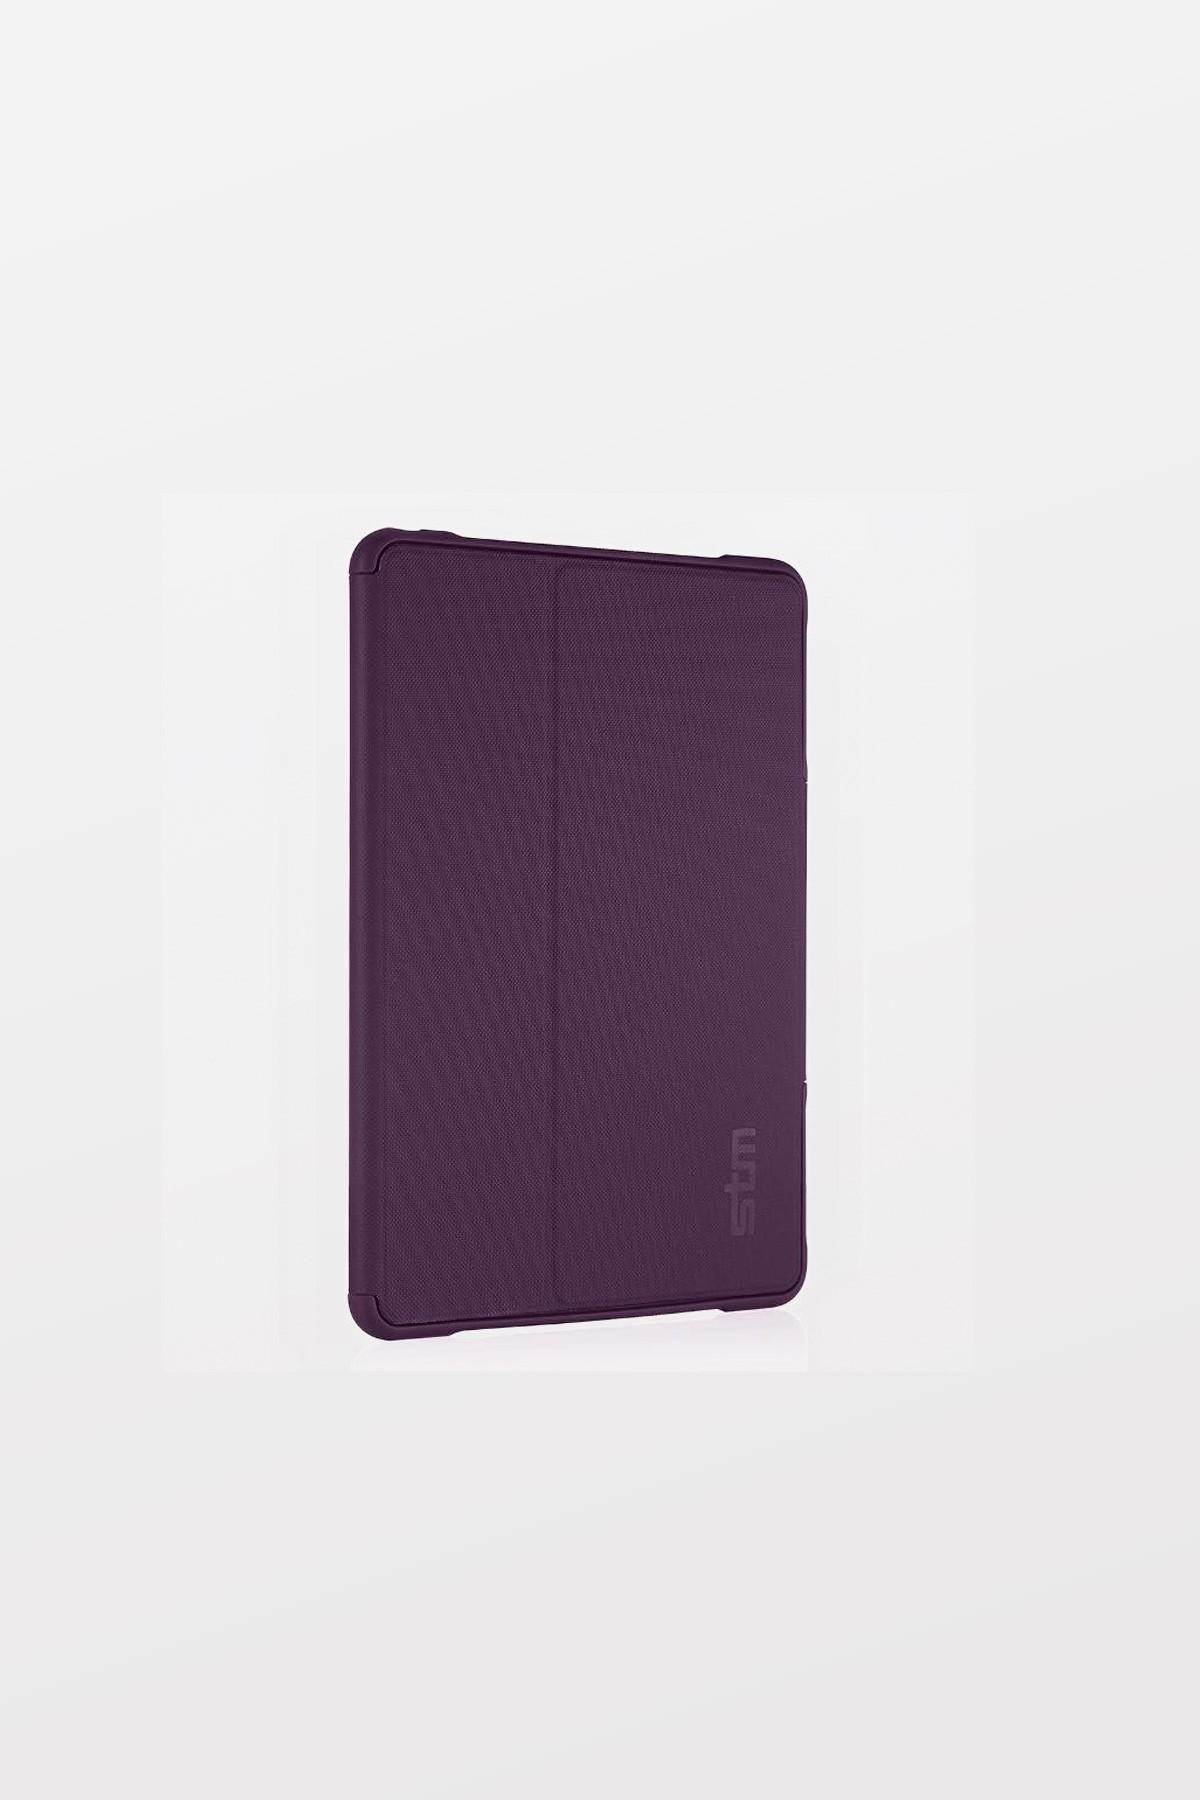 STM Dux for iPad Mini 4 - Blackberry